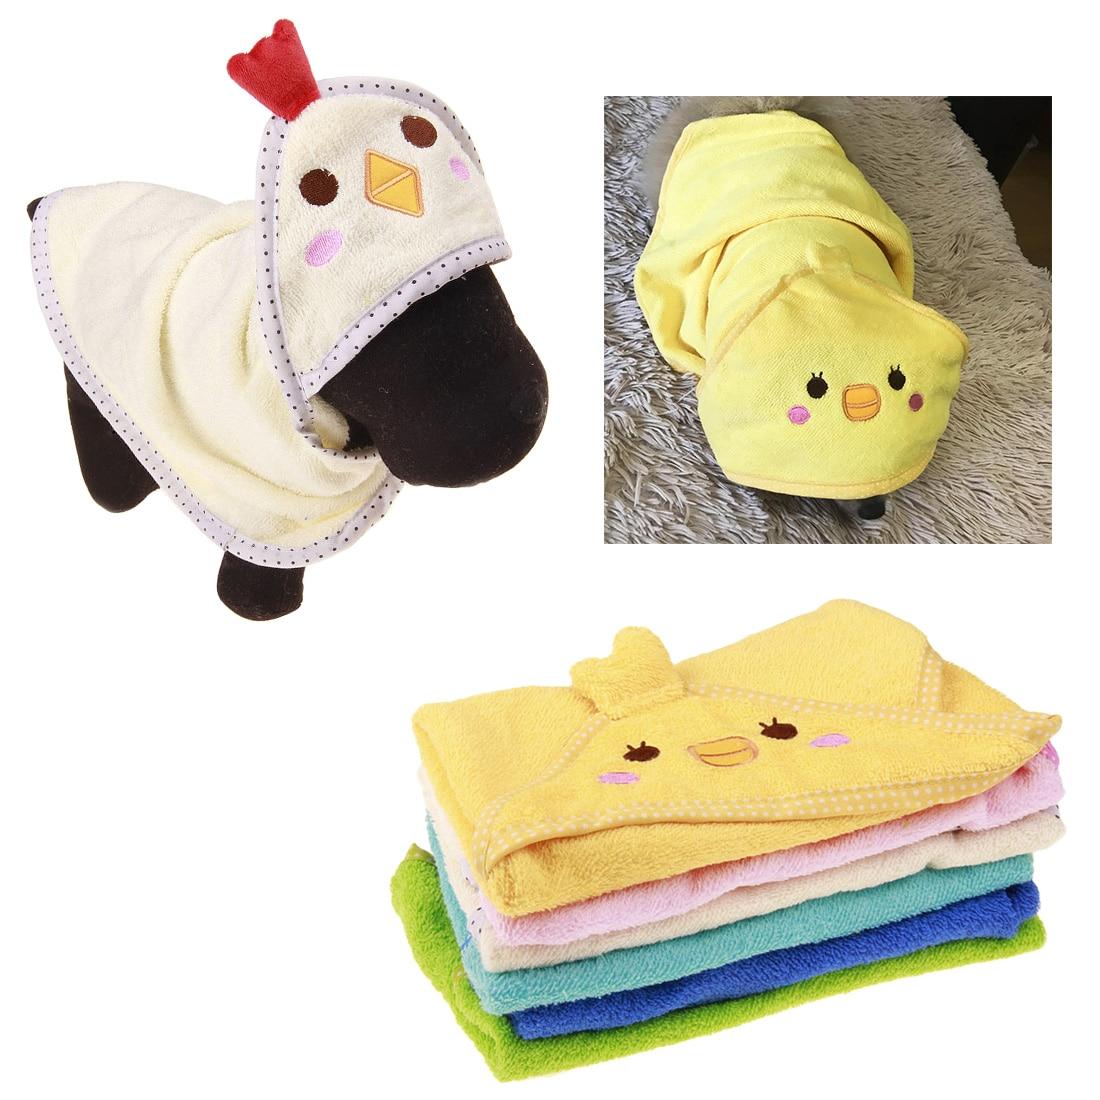 New Develop Pet Dog Cartoon Animal Bathrobes Bath Towel Puppy Cat Washing Accesorios Dogs Pets Accessories